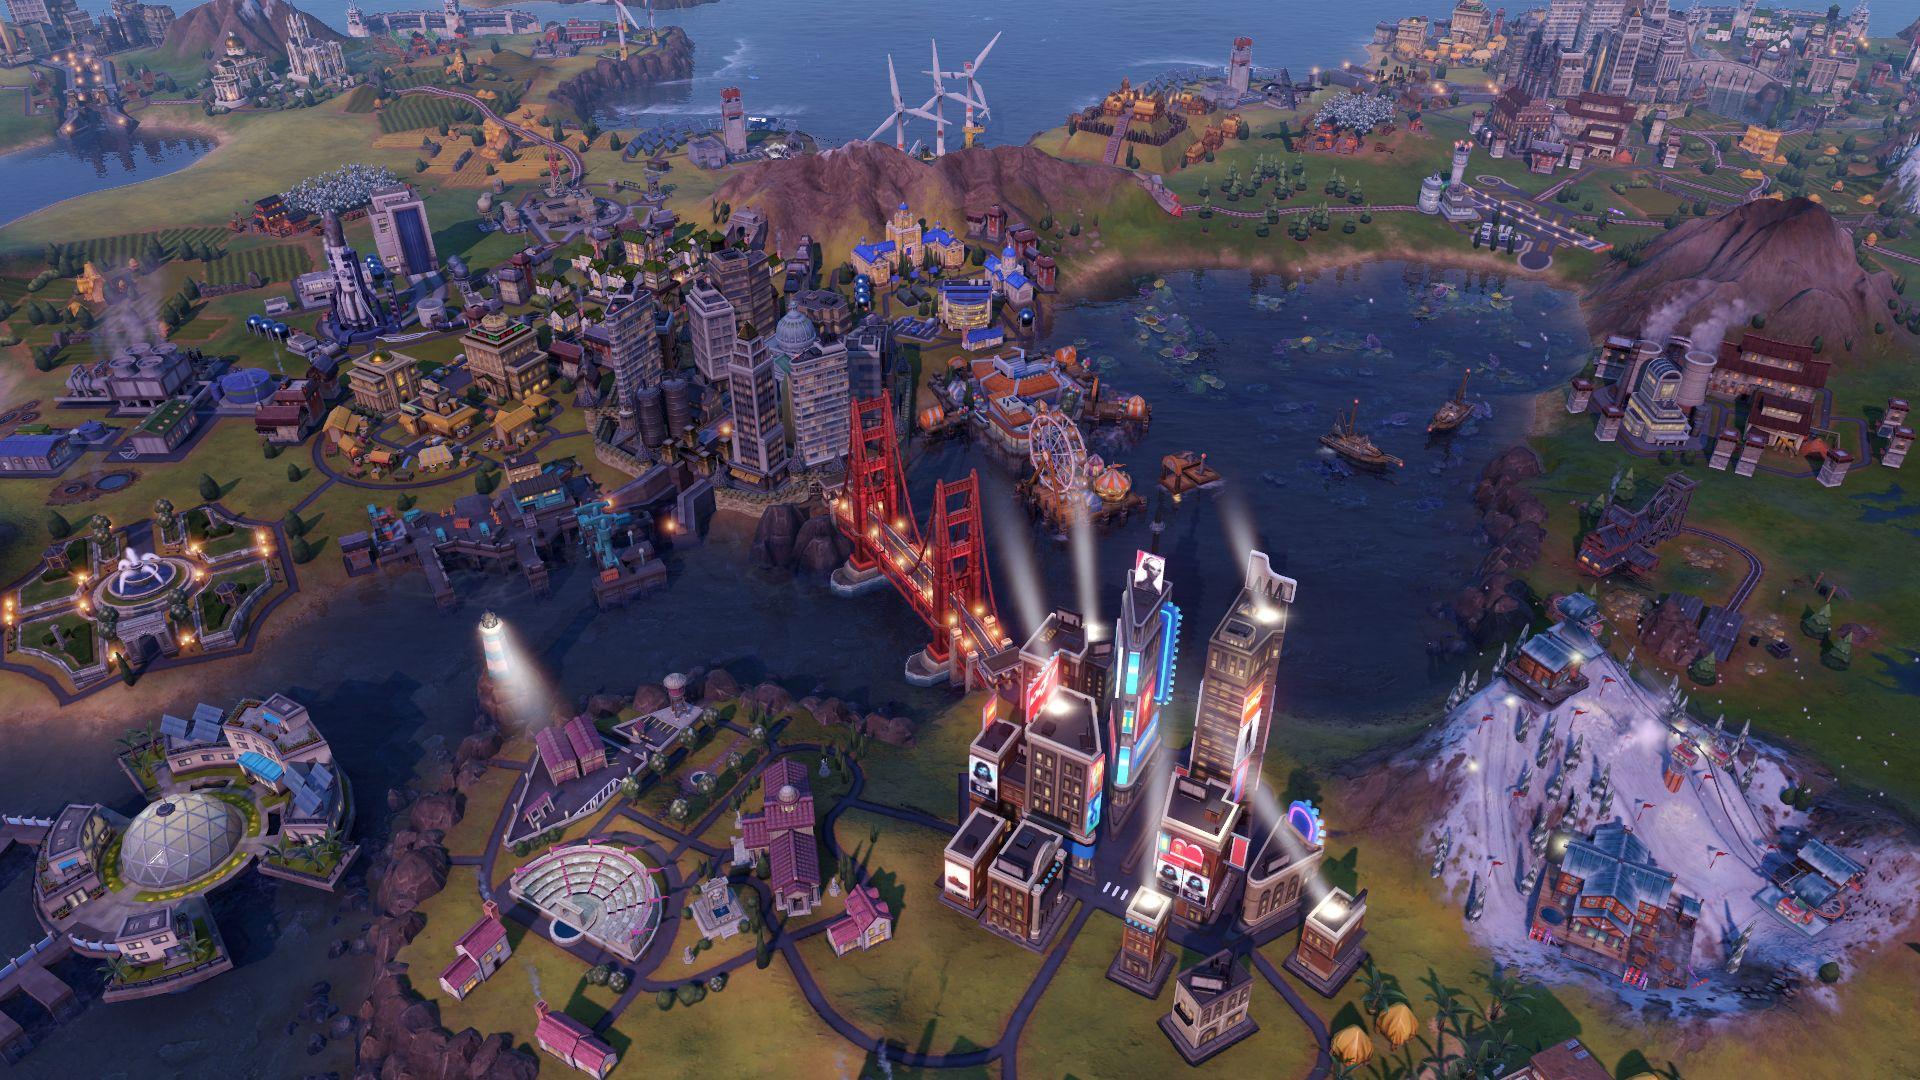 2K Games, Civilization VI, Firaxis